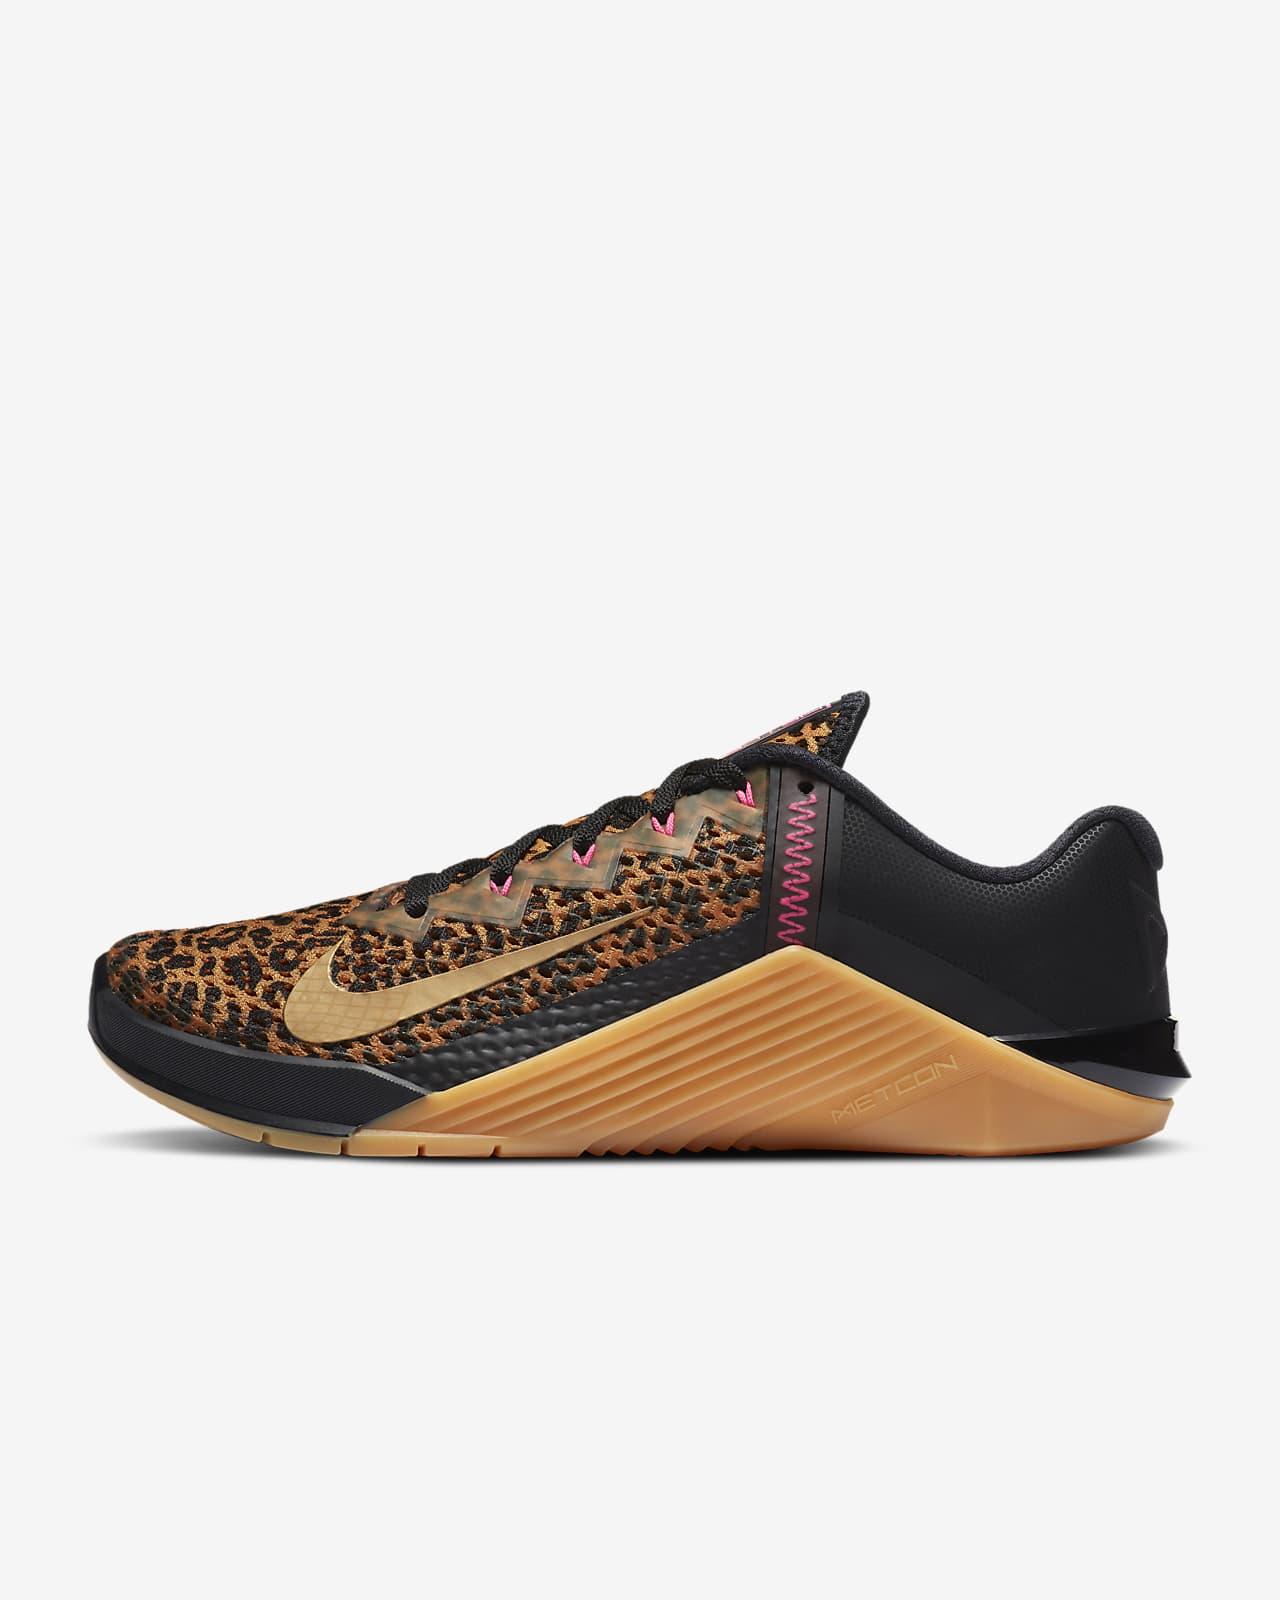 Dámská tréninková bota Nike Metcon 6